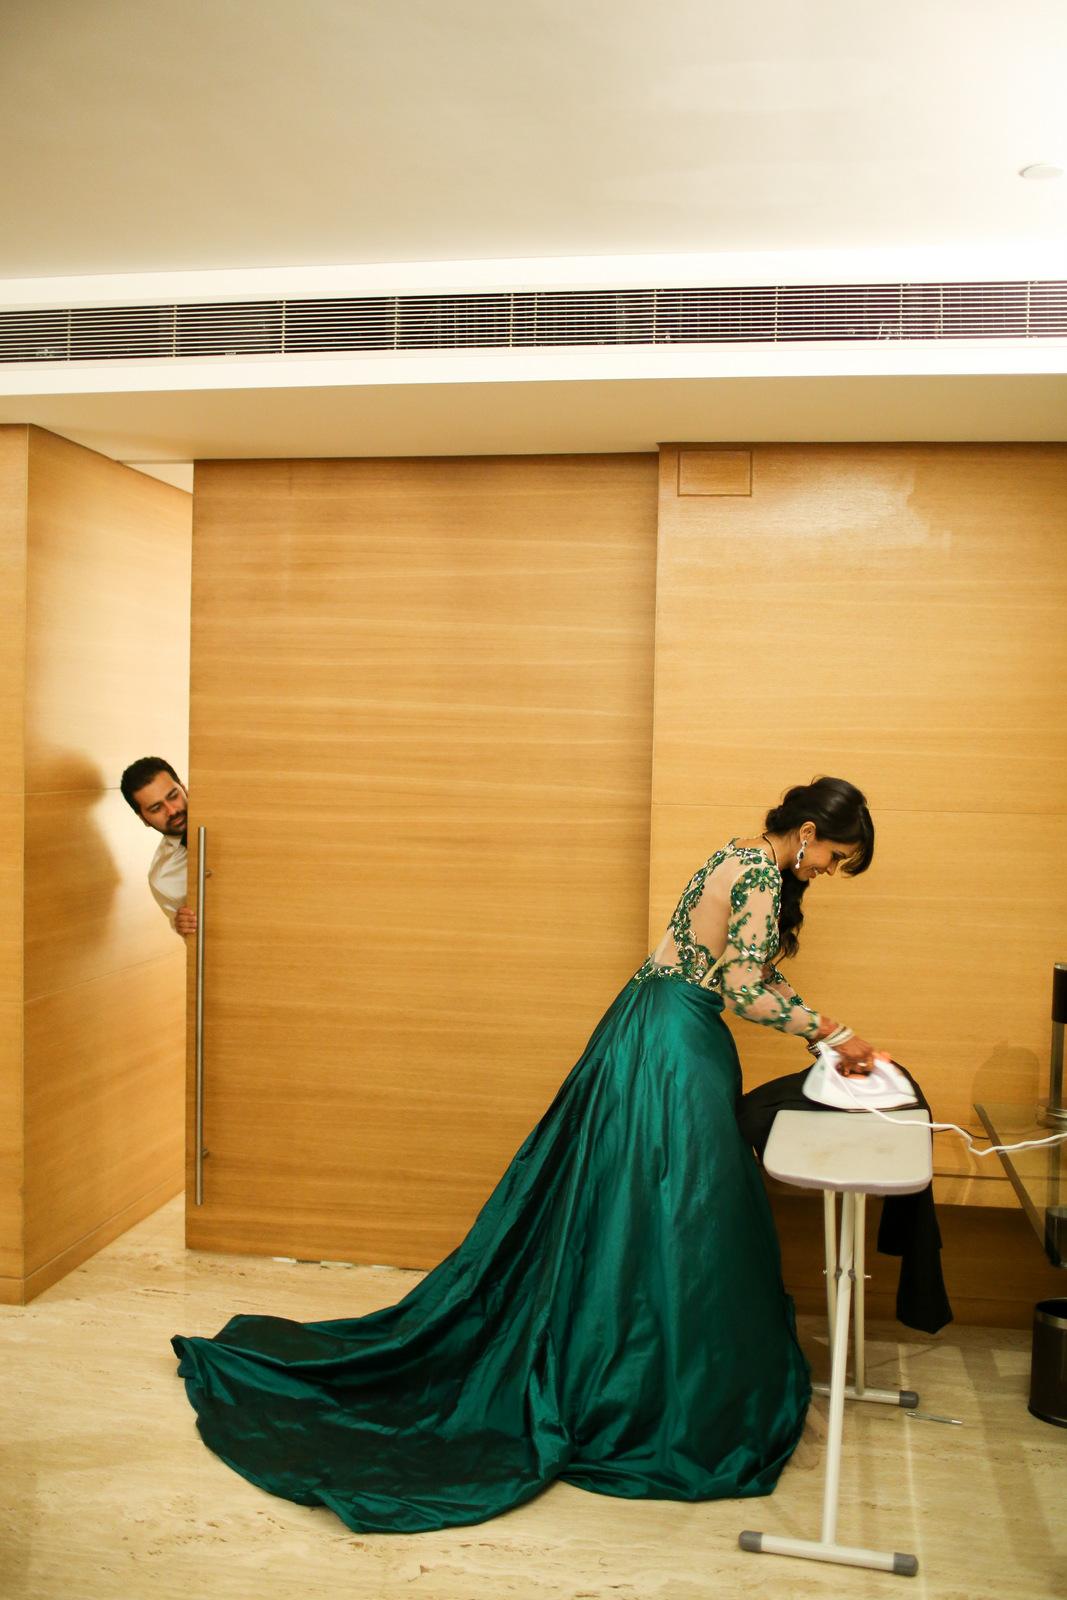 mumbai-wedding-into-candid-photography-mp-35.jpg